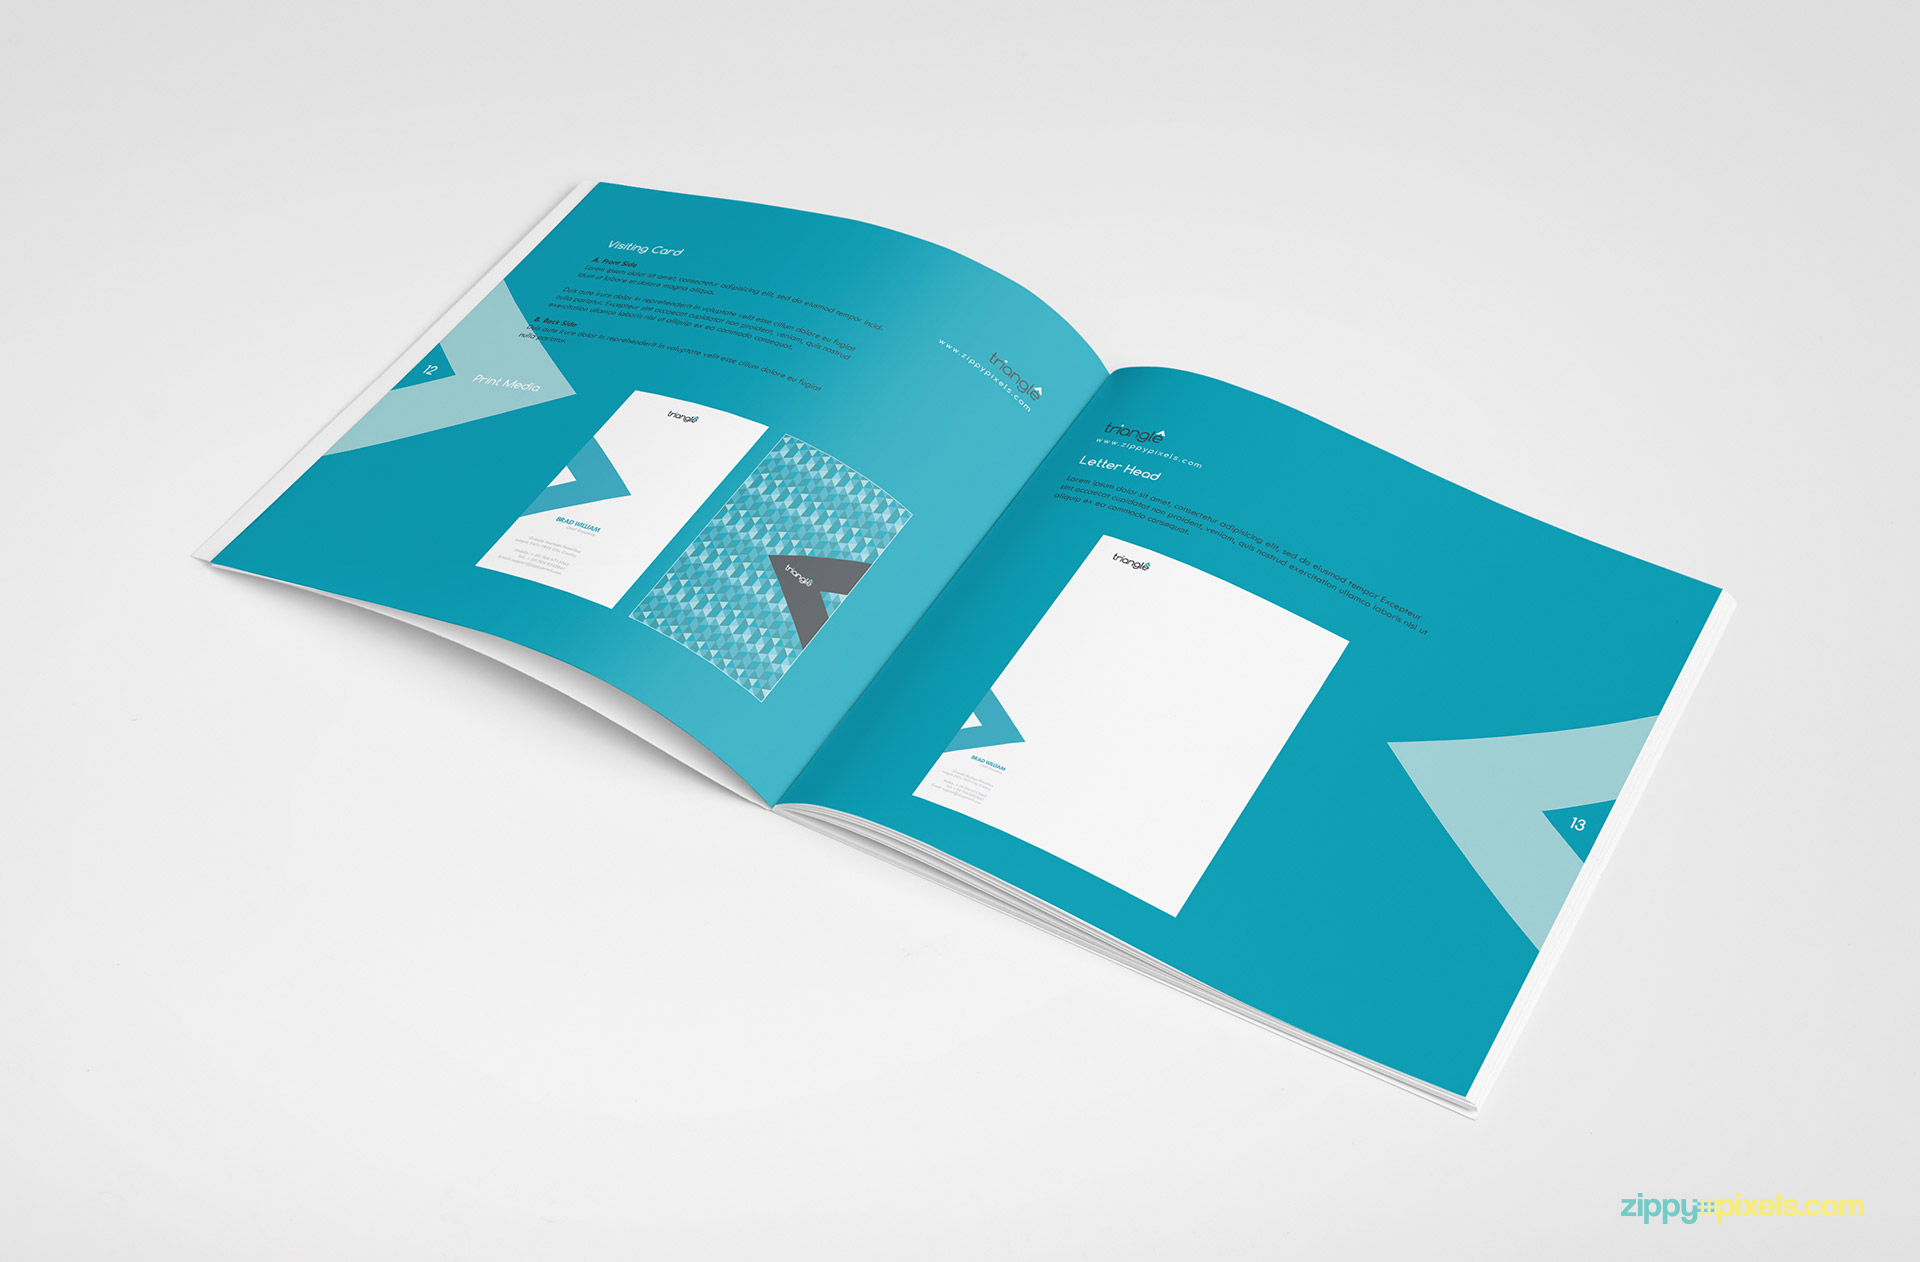 09-brand-book-11-print-media